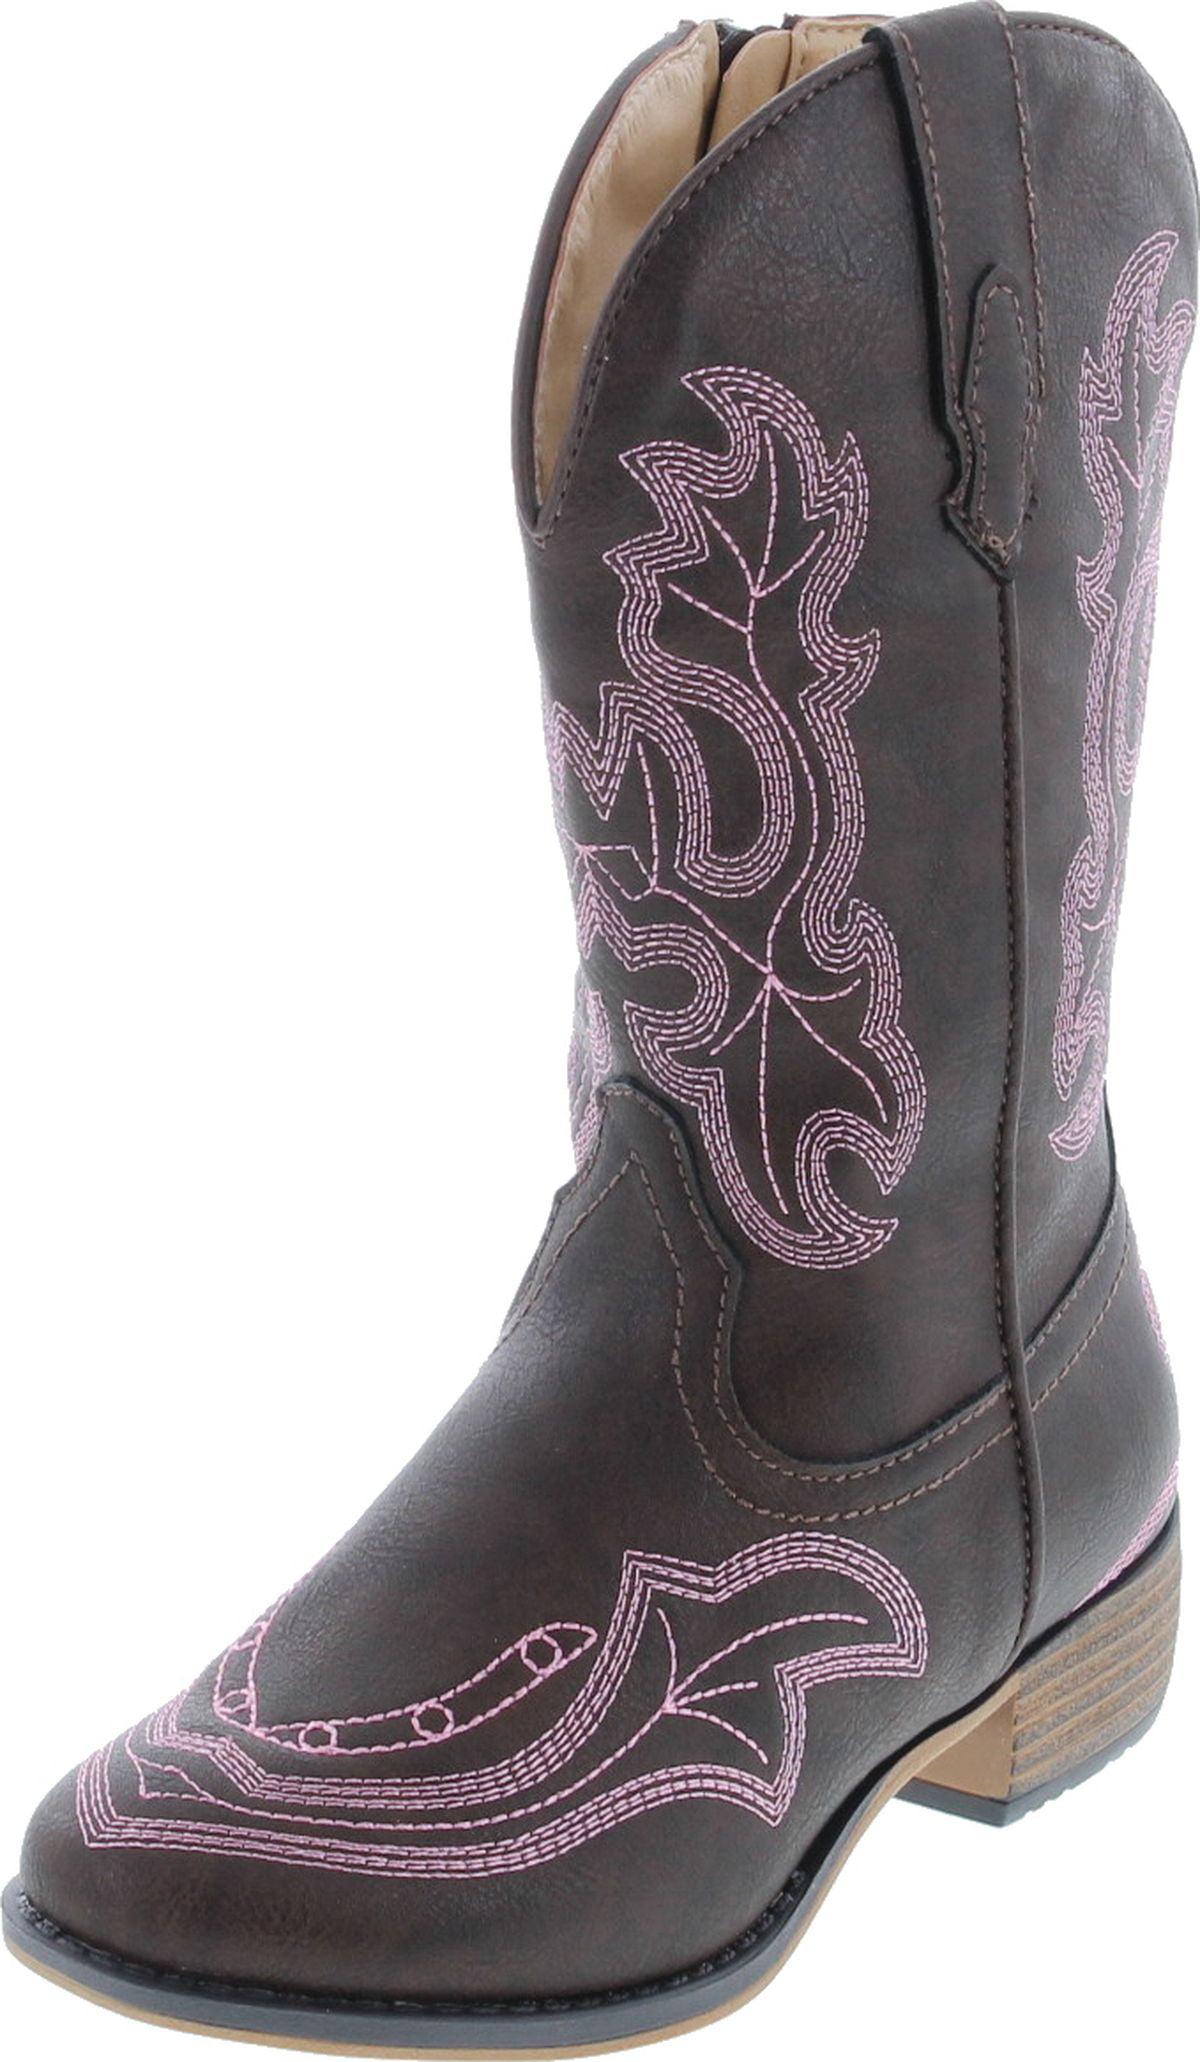 Toddler//Little Kid Leatherette Zebra Glint Print 3 Little Kid M Old West Kids Boots Girls Leatherette Western Boots